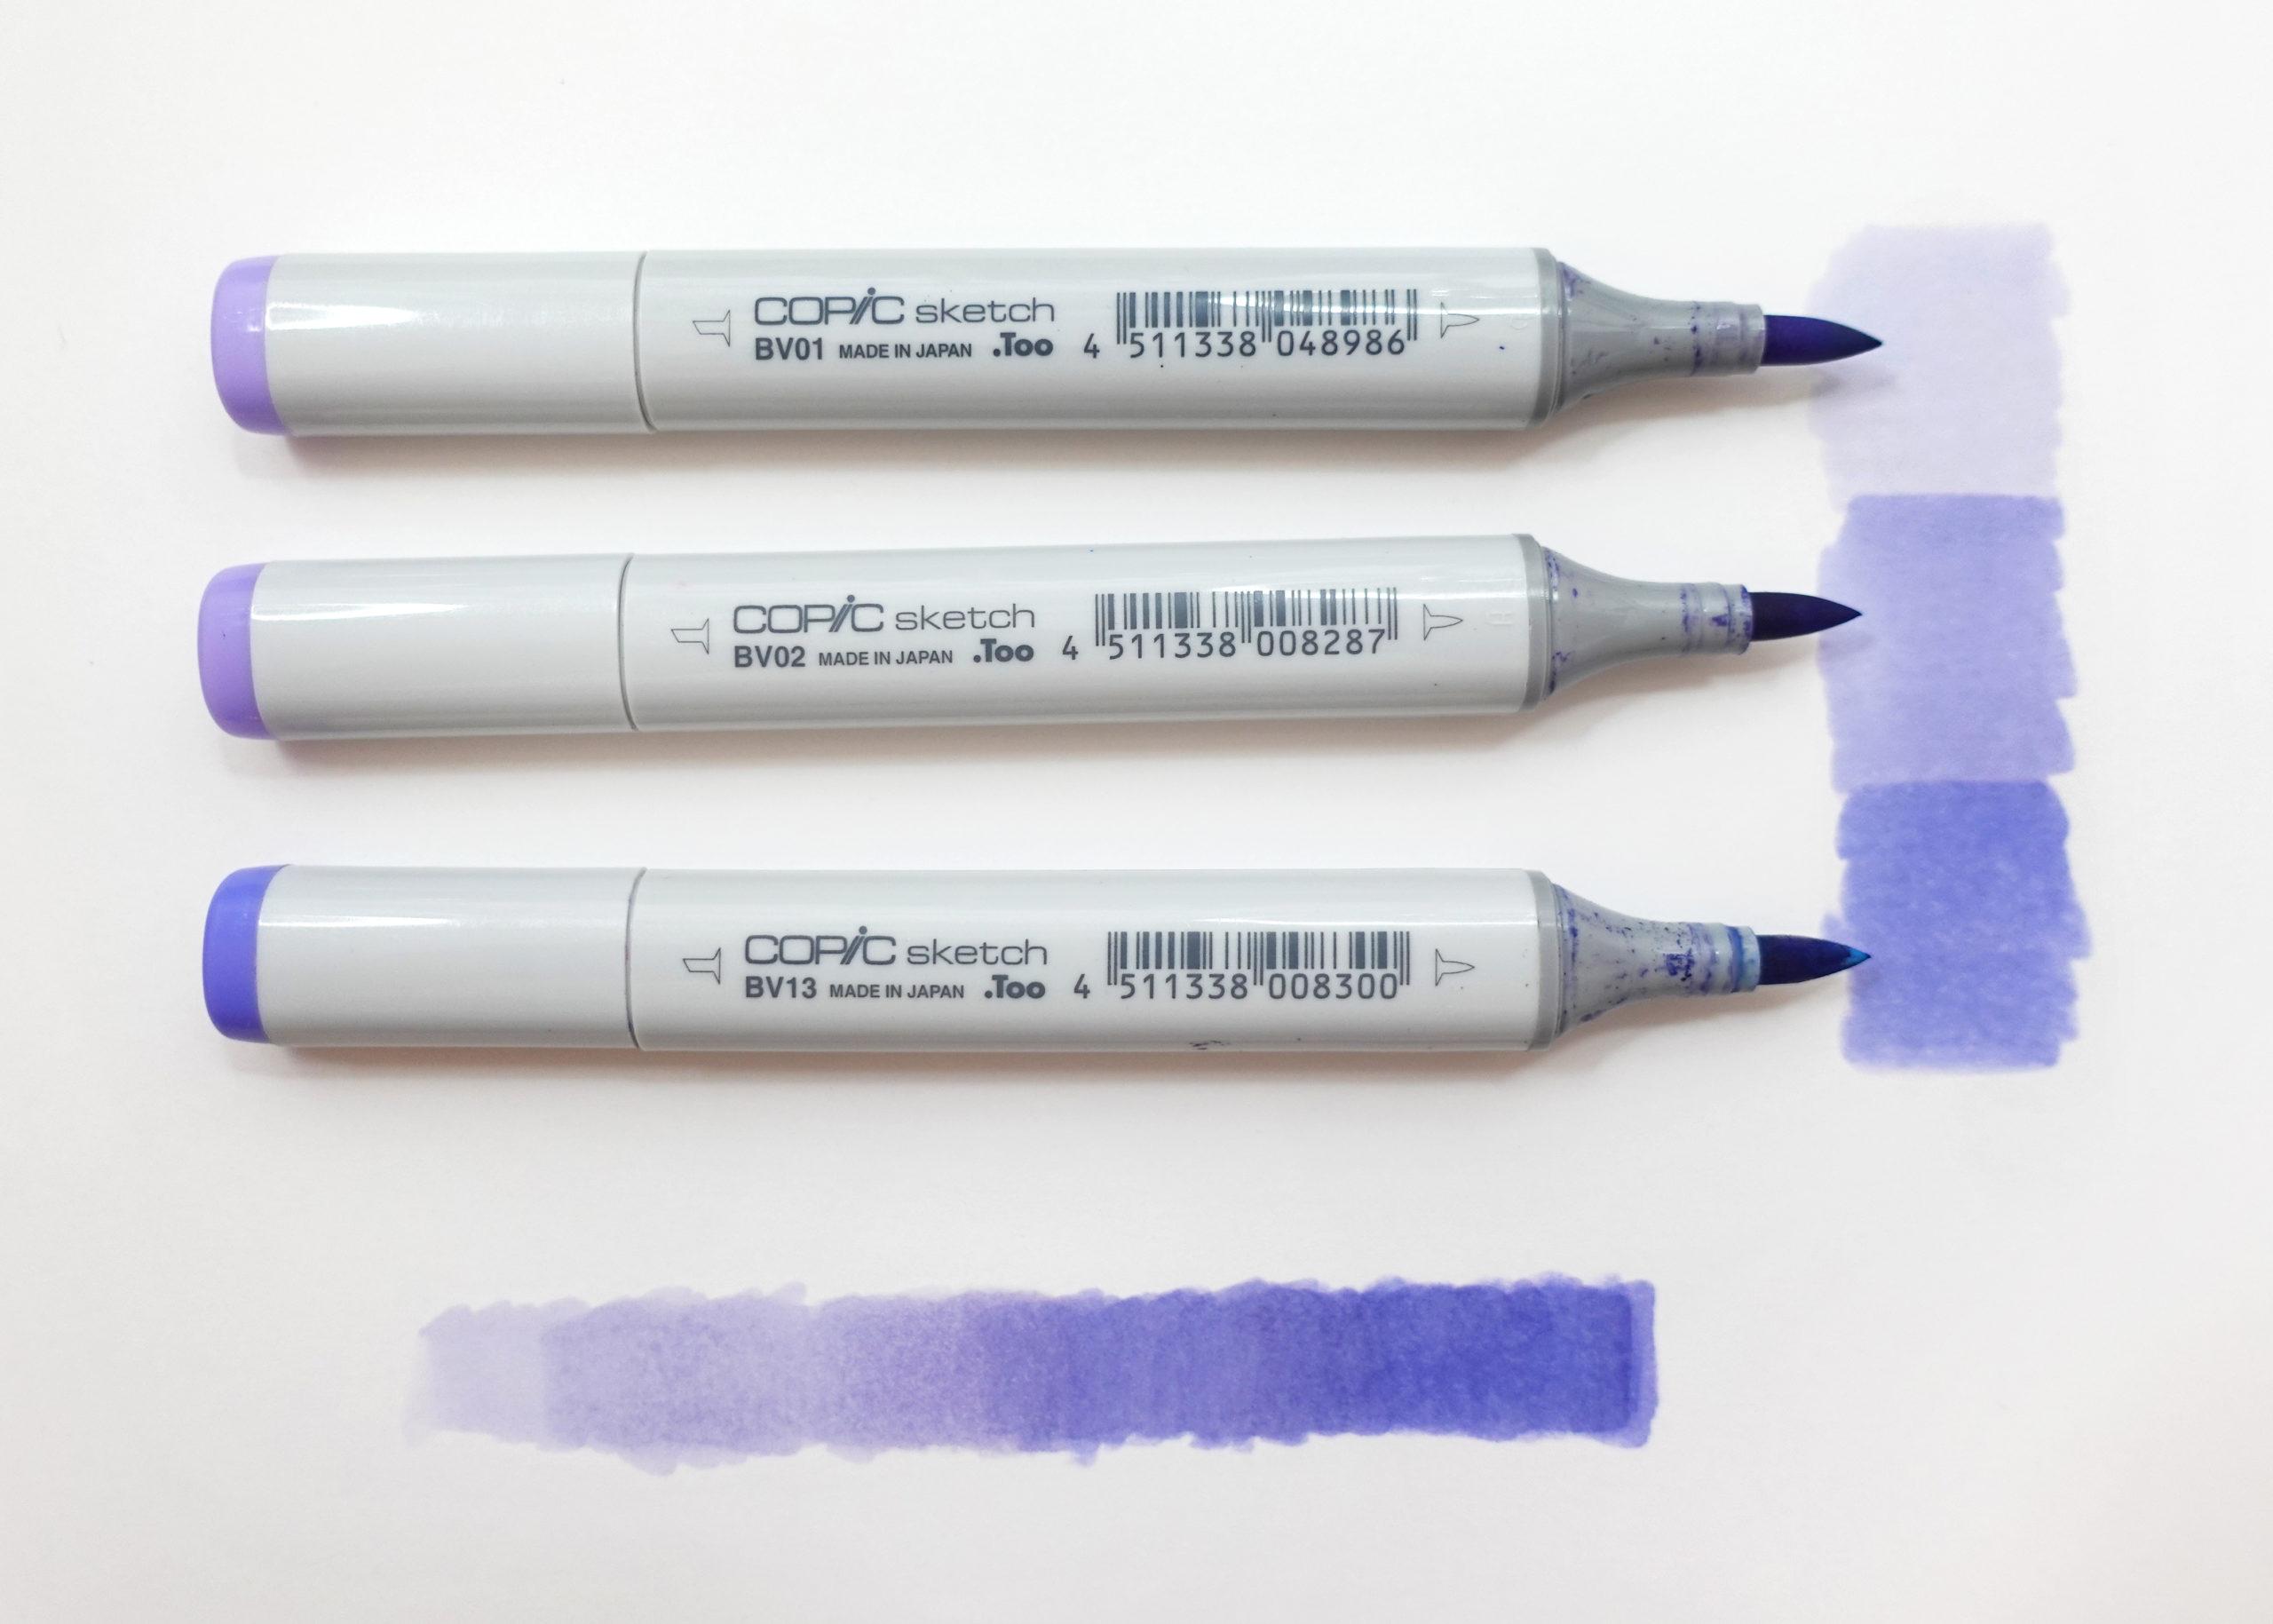 Joanna Baker Copic Sketch Marker Blending Tips